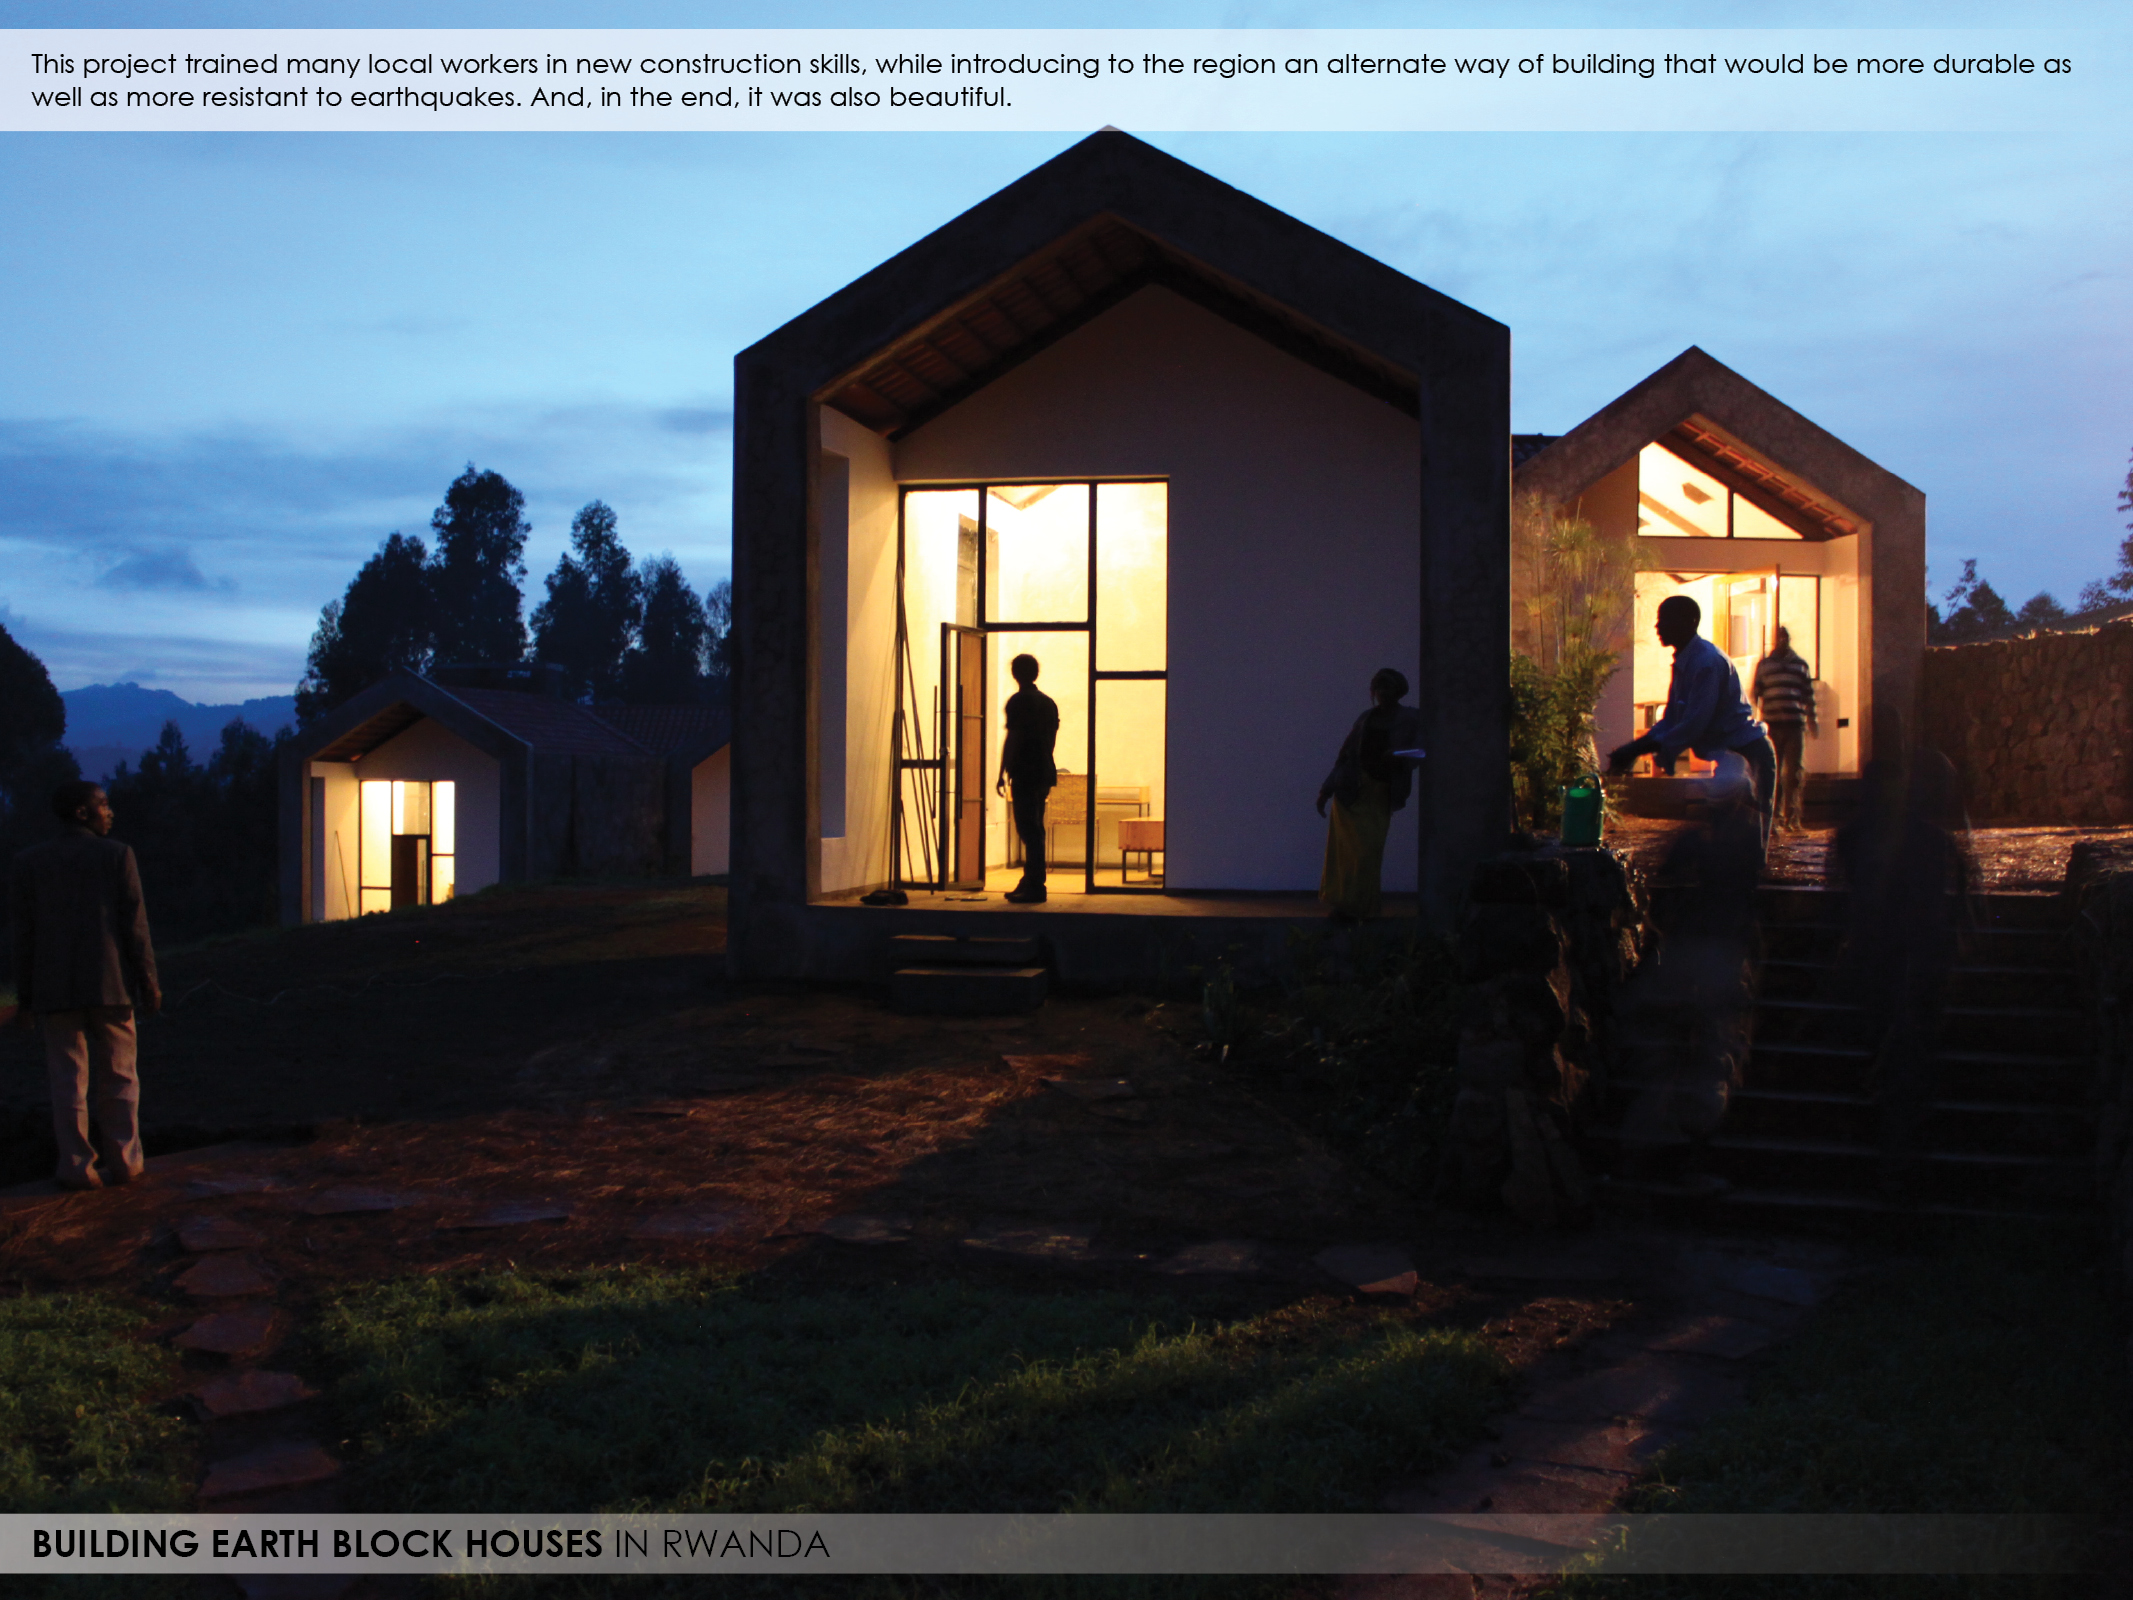 Gaugler_RwandaExperience_p39.jpg